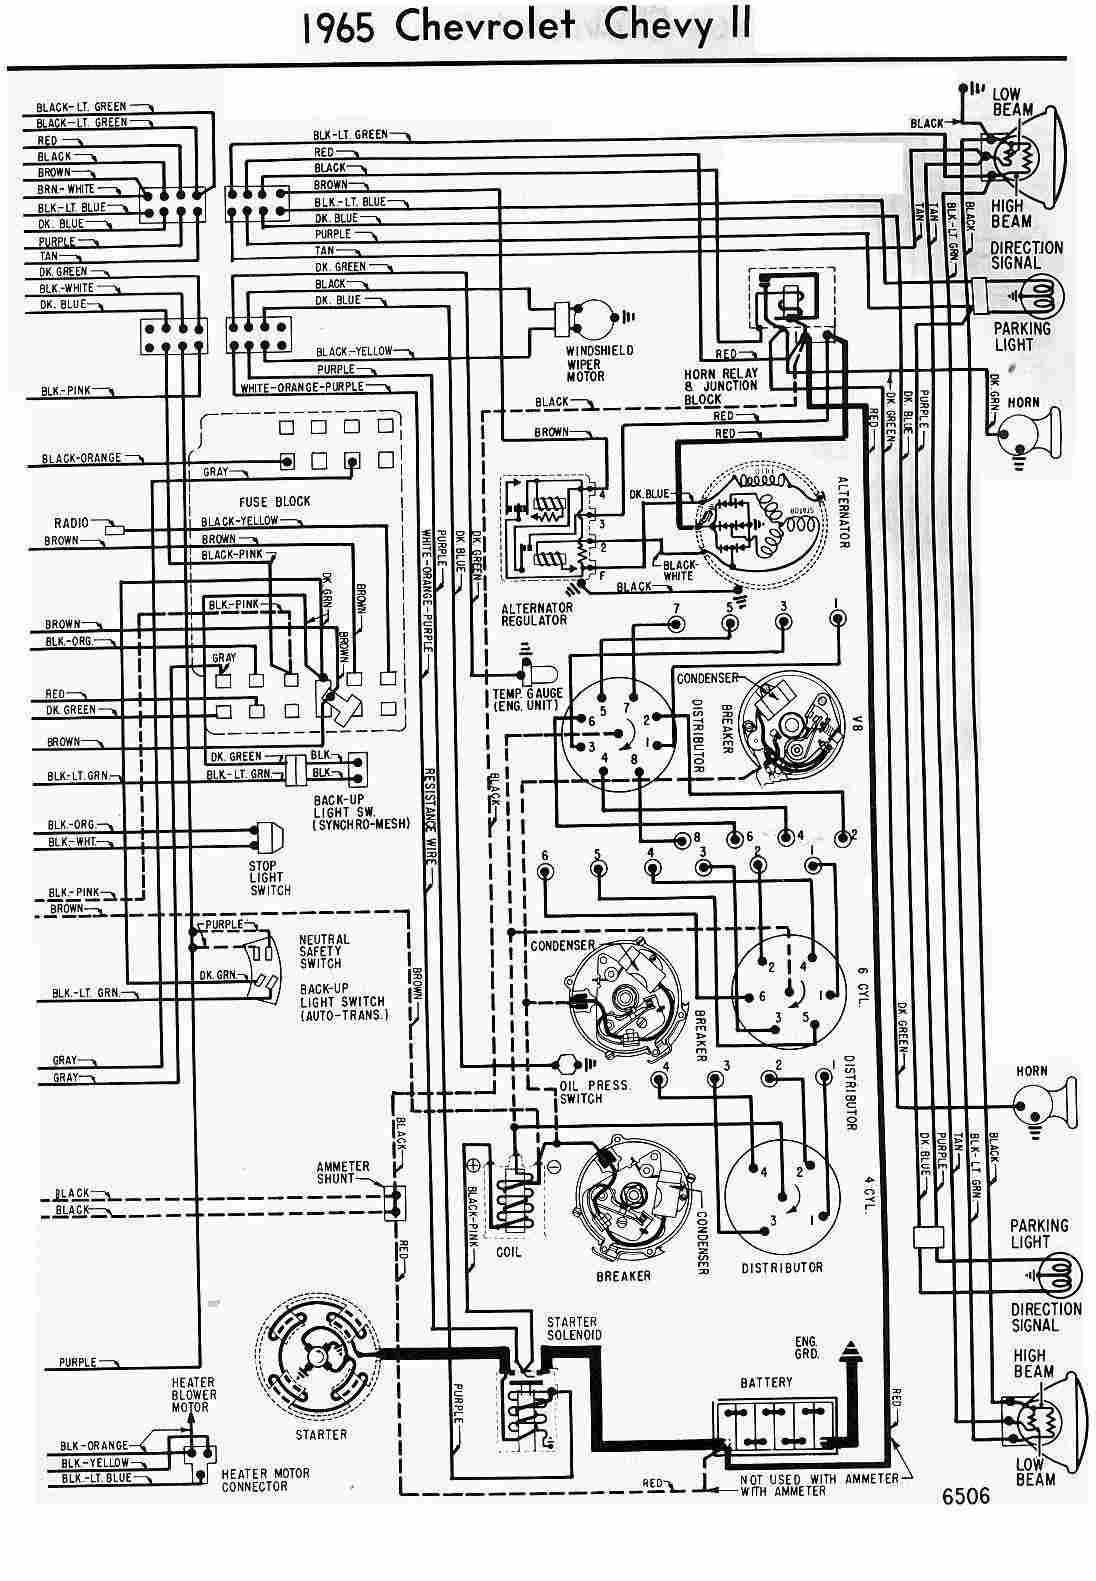 medium resolution of 1966 chevelle ss engine harness diagram wiring diagram todays 1967 fairlane wiring diagram 1966 chevelle wiring